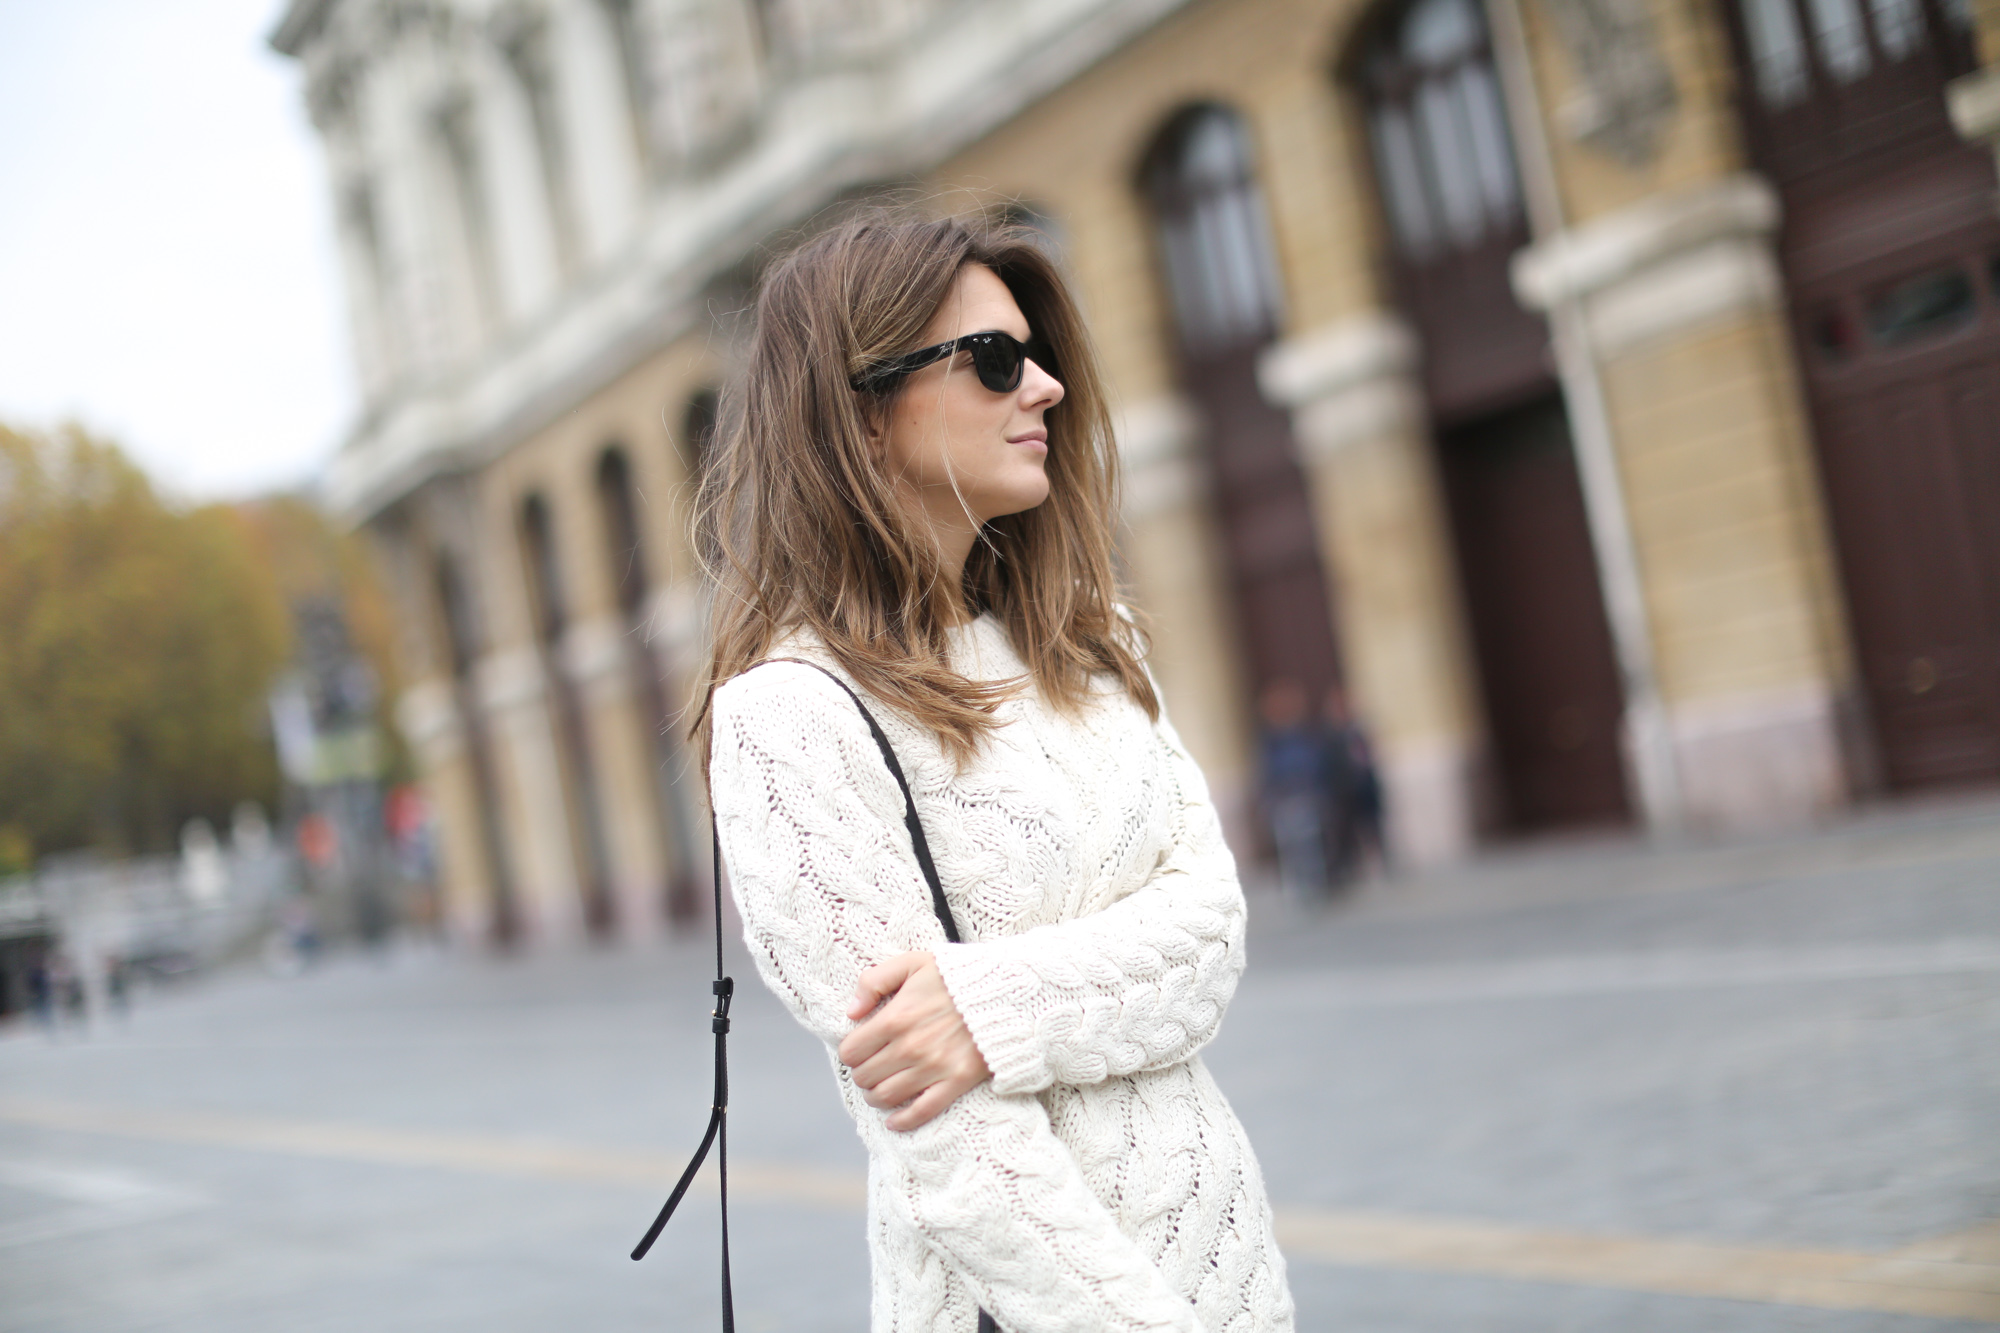 Clochet-streetstyle-isabel-marant-etoile-ellison-parka-acne-studios-jeans-adidas-stan-smith-9